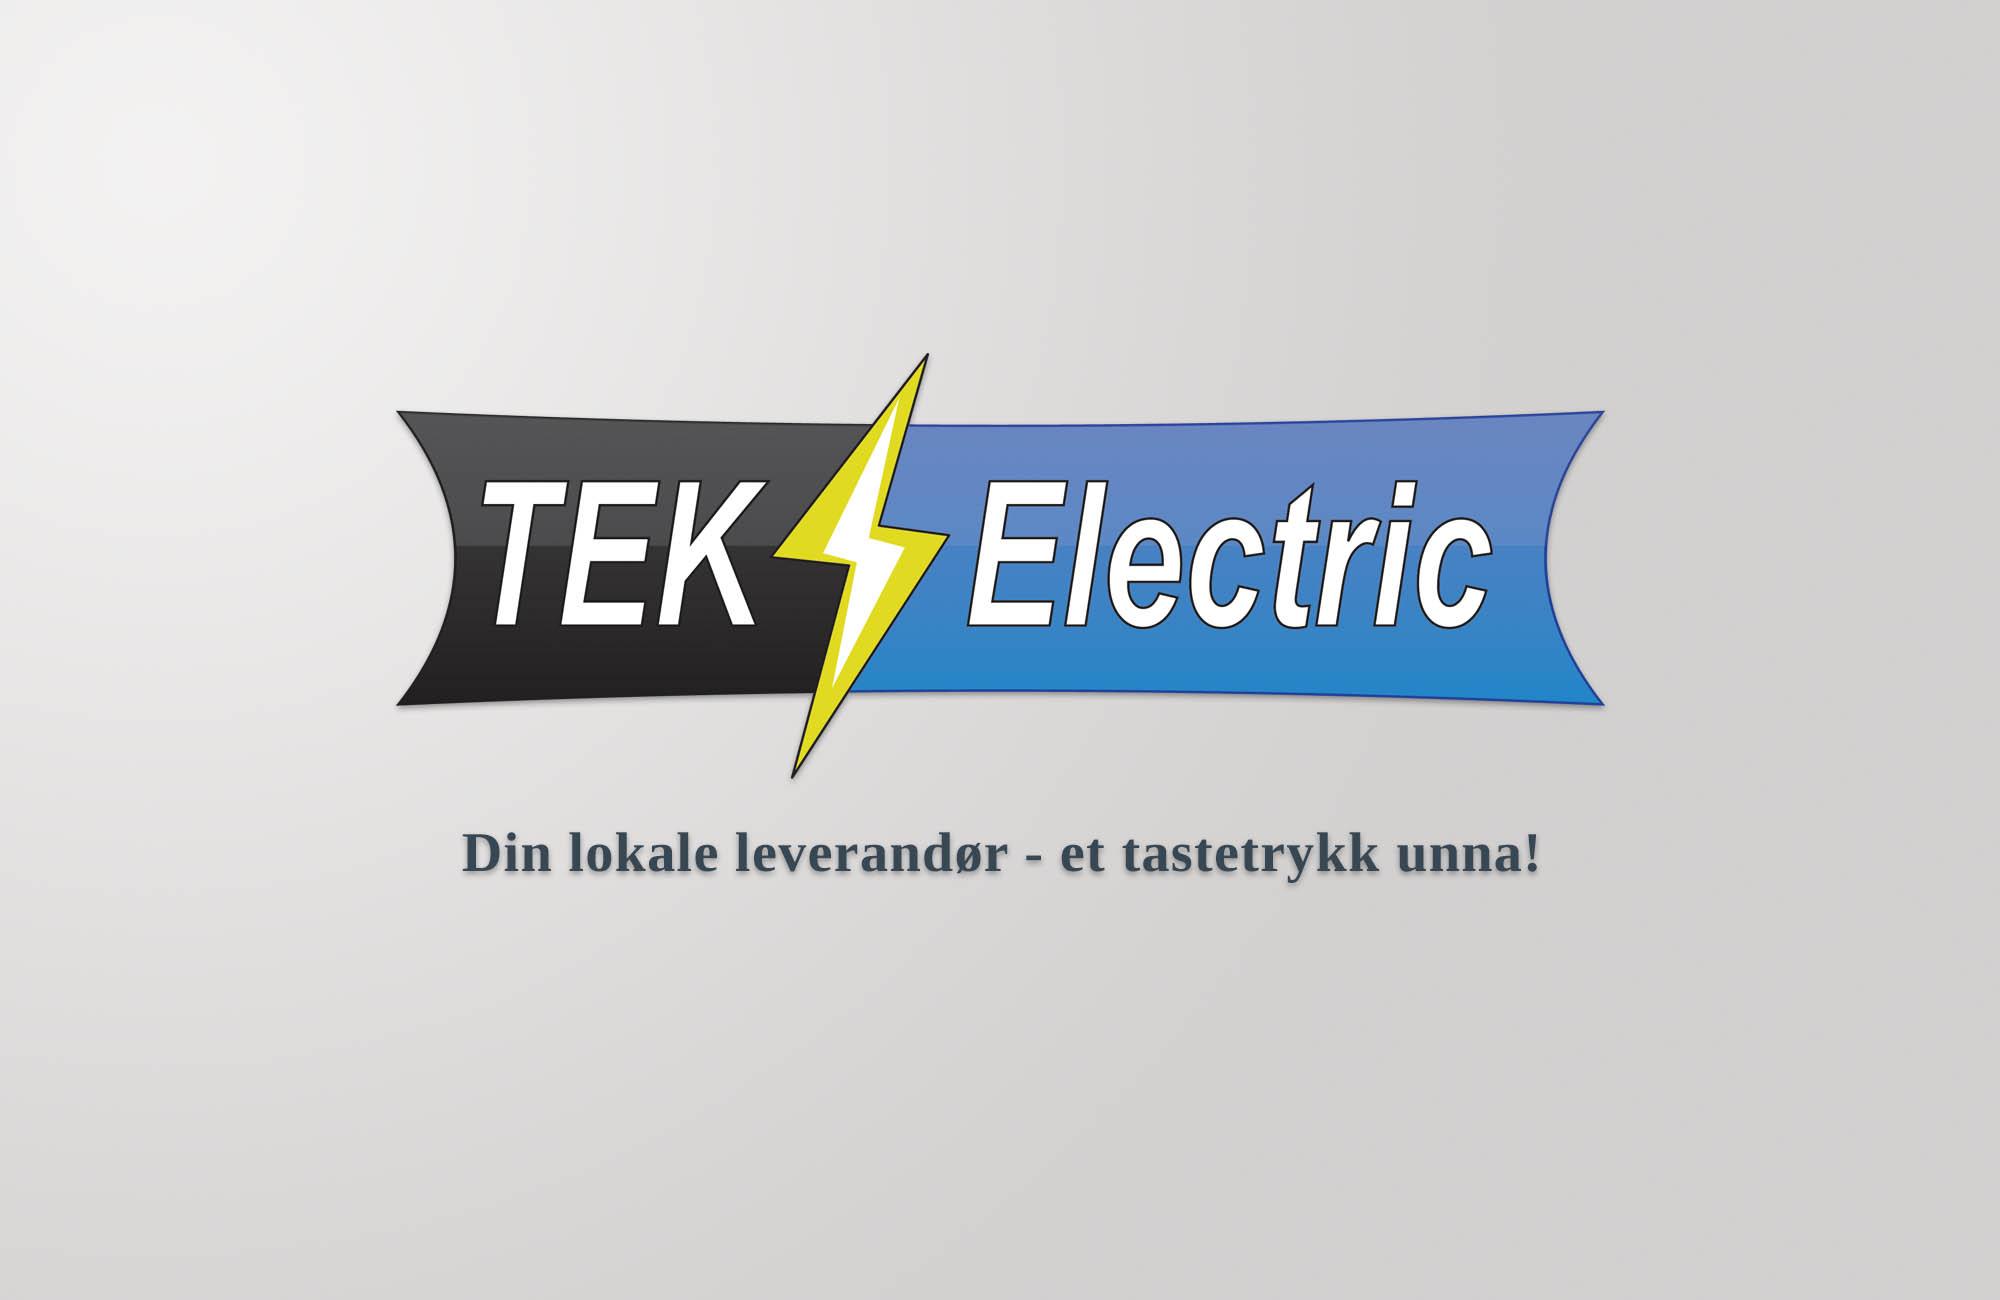 TEK Electric sin logo designet av VIAVISIO